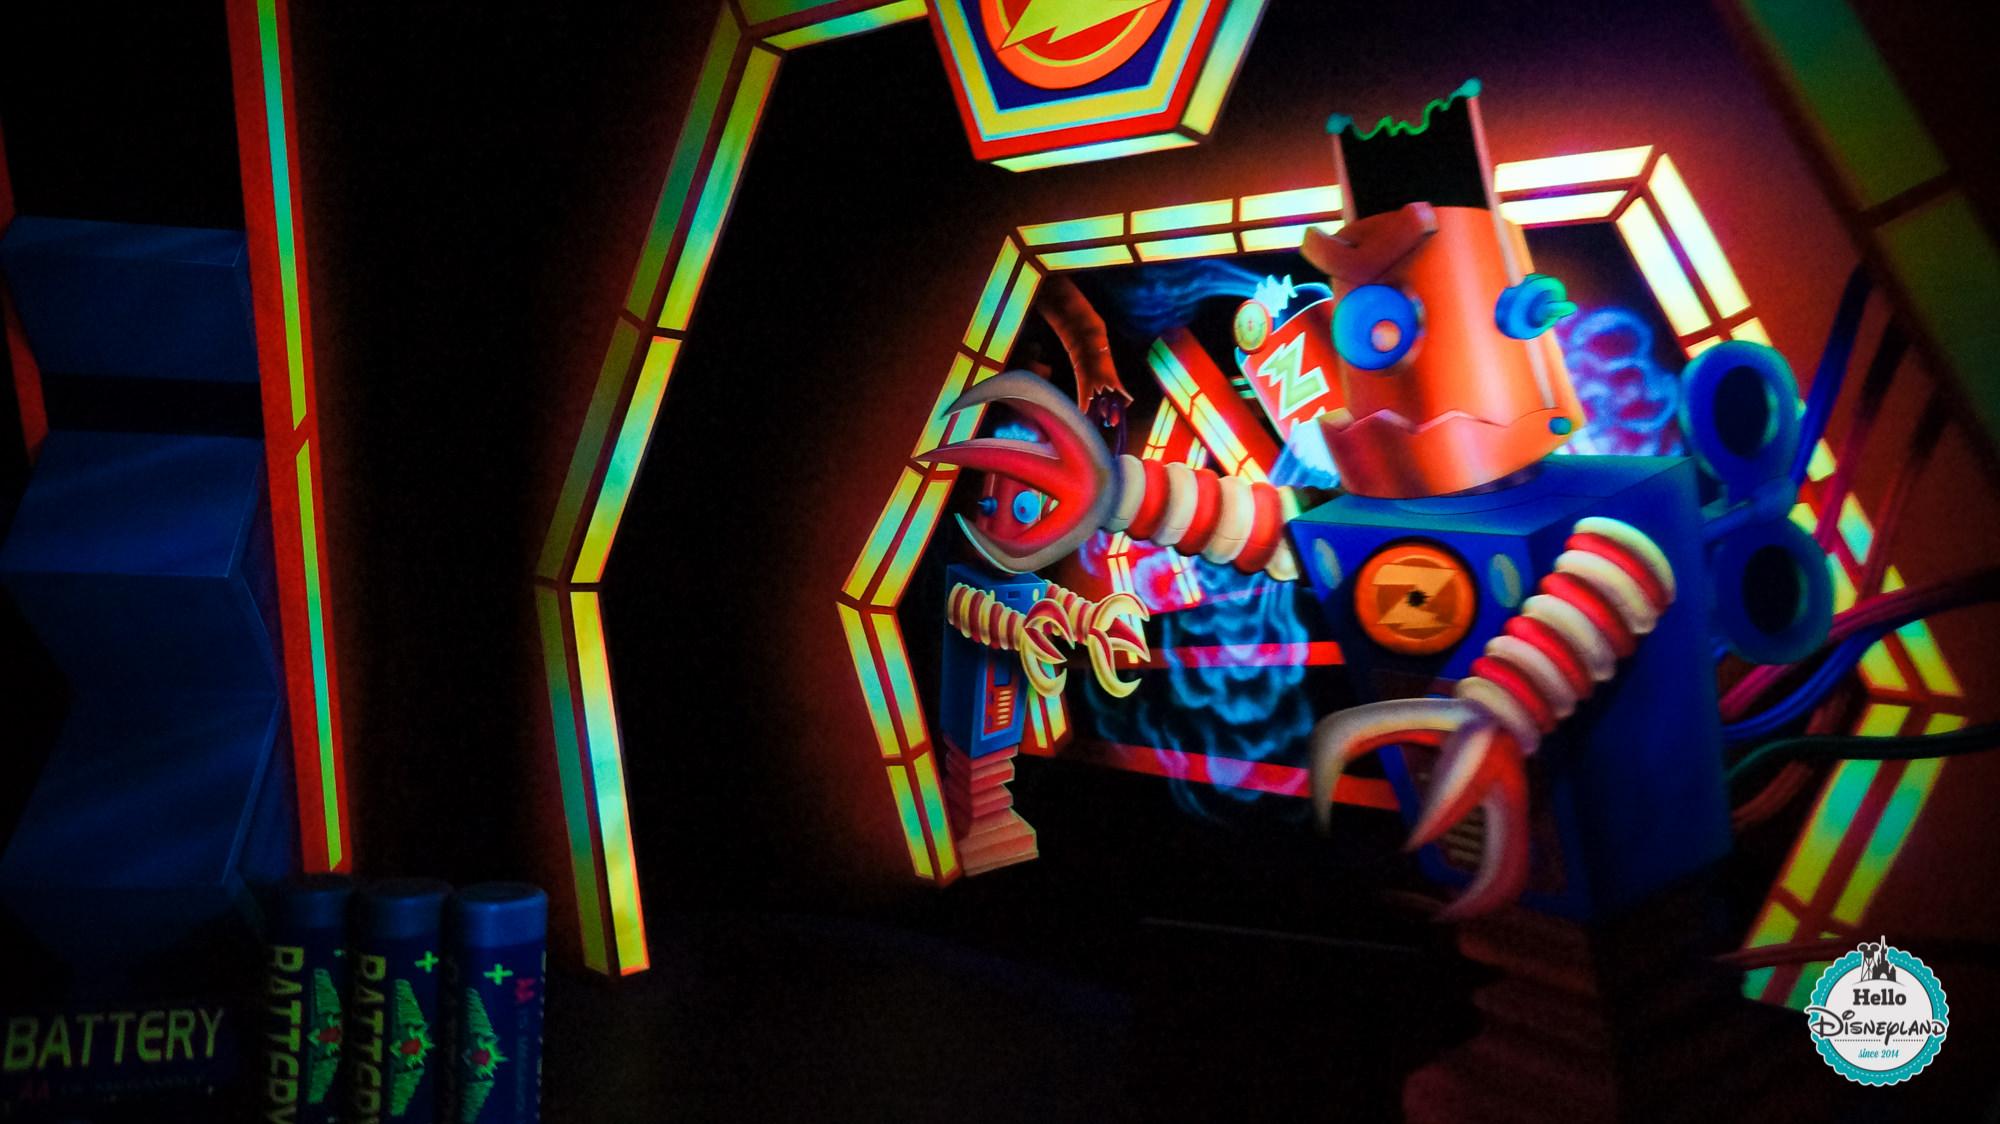 Hello Disneyland : Le blog n°1 sur Disneyland Paris | Buzz